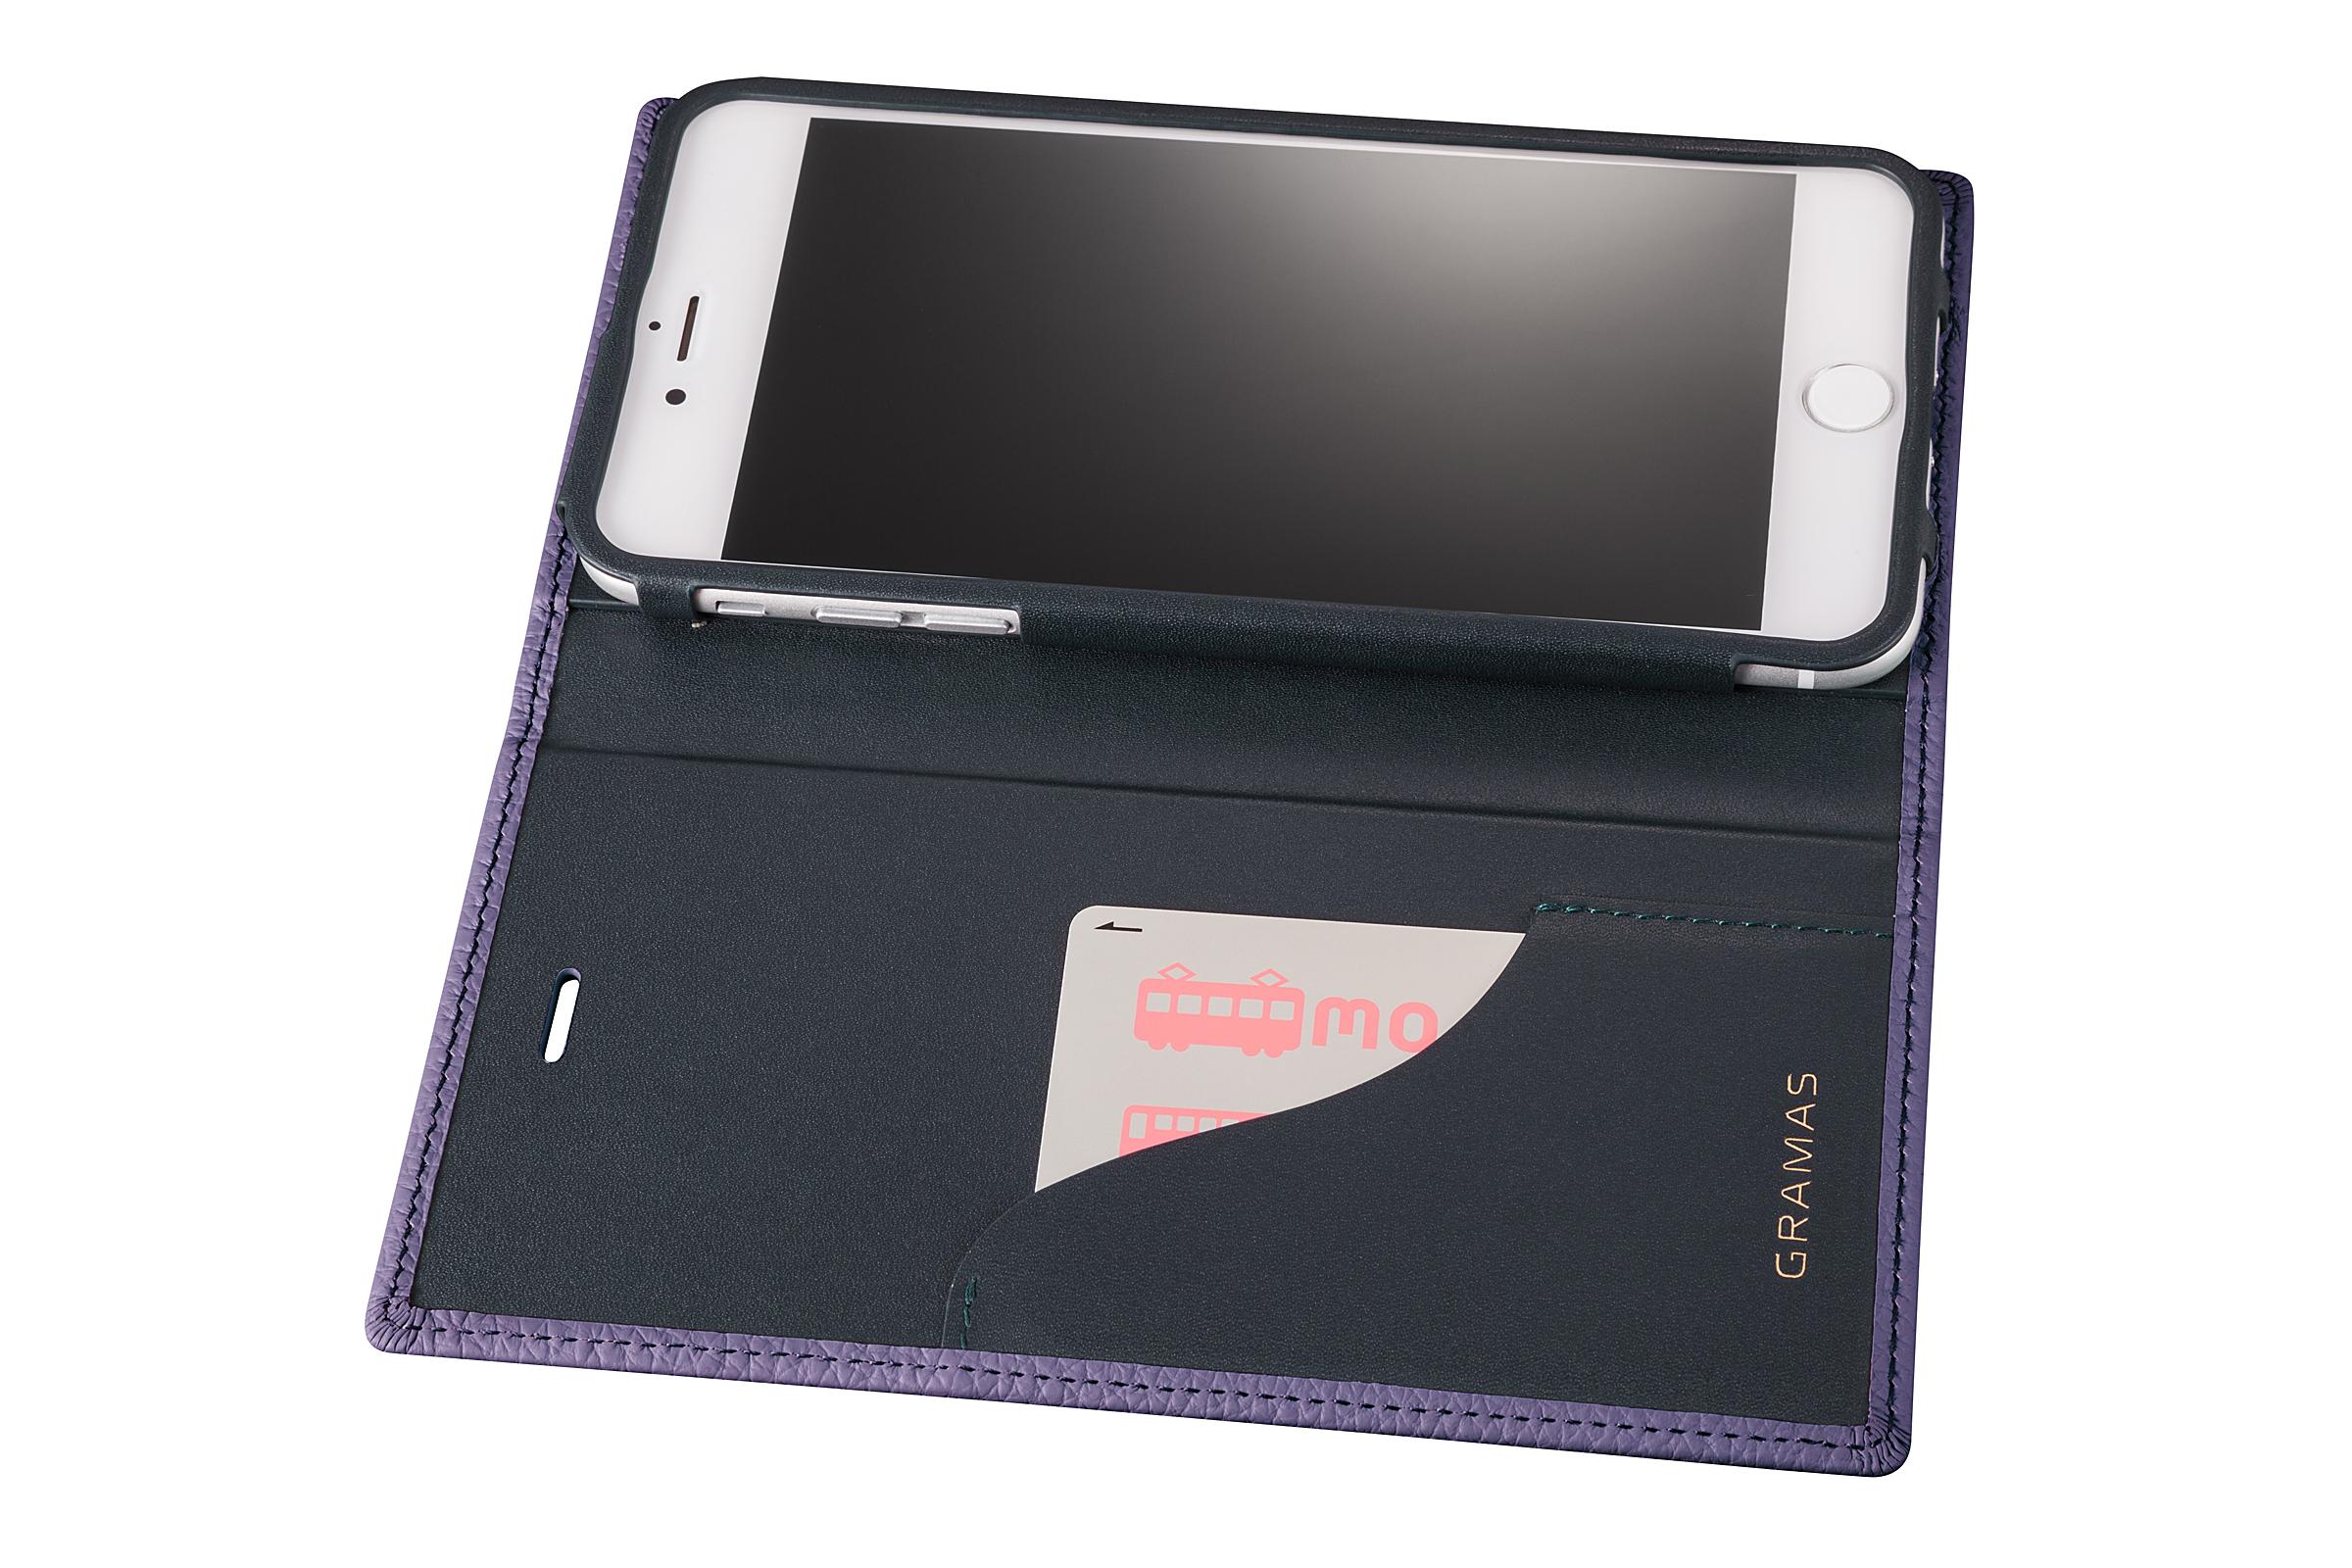 GRAMAS Shrunken-calf Full Leather Case for iPhone 7 Plus(Purple) シュランケンカーフ 手帳型フルレザーケース - 画像4